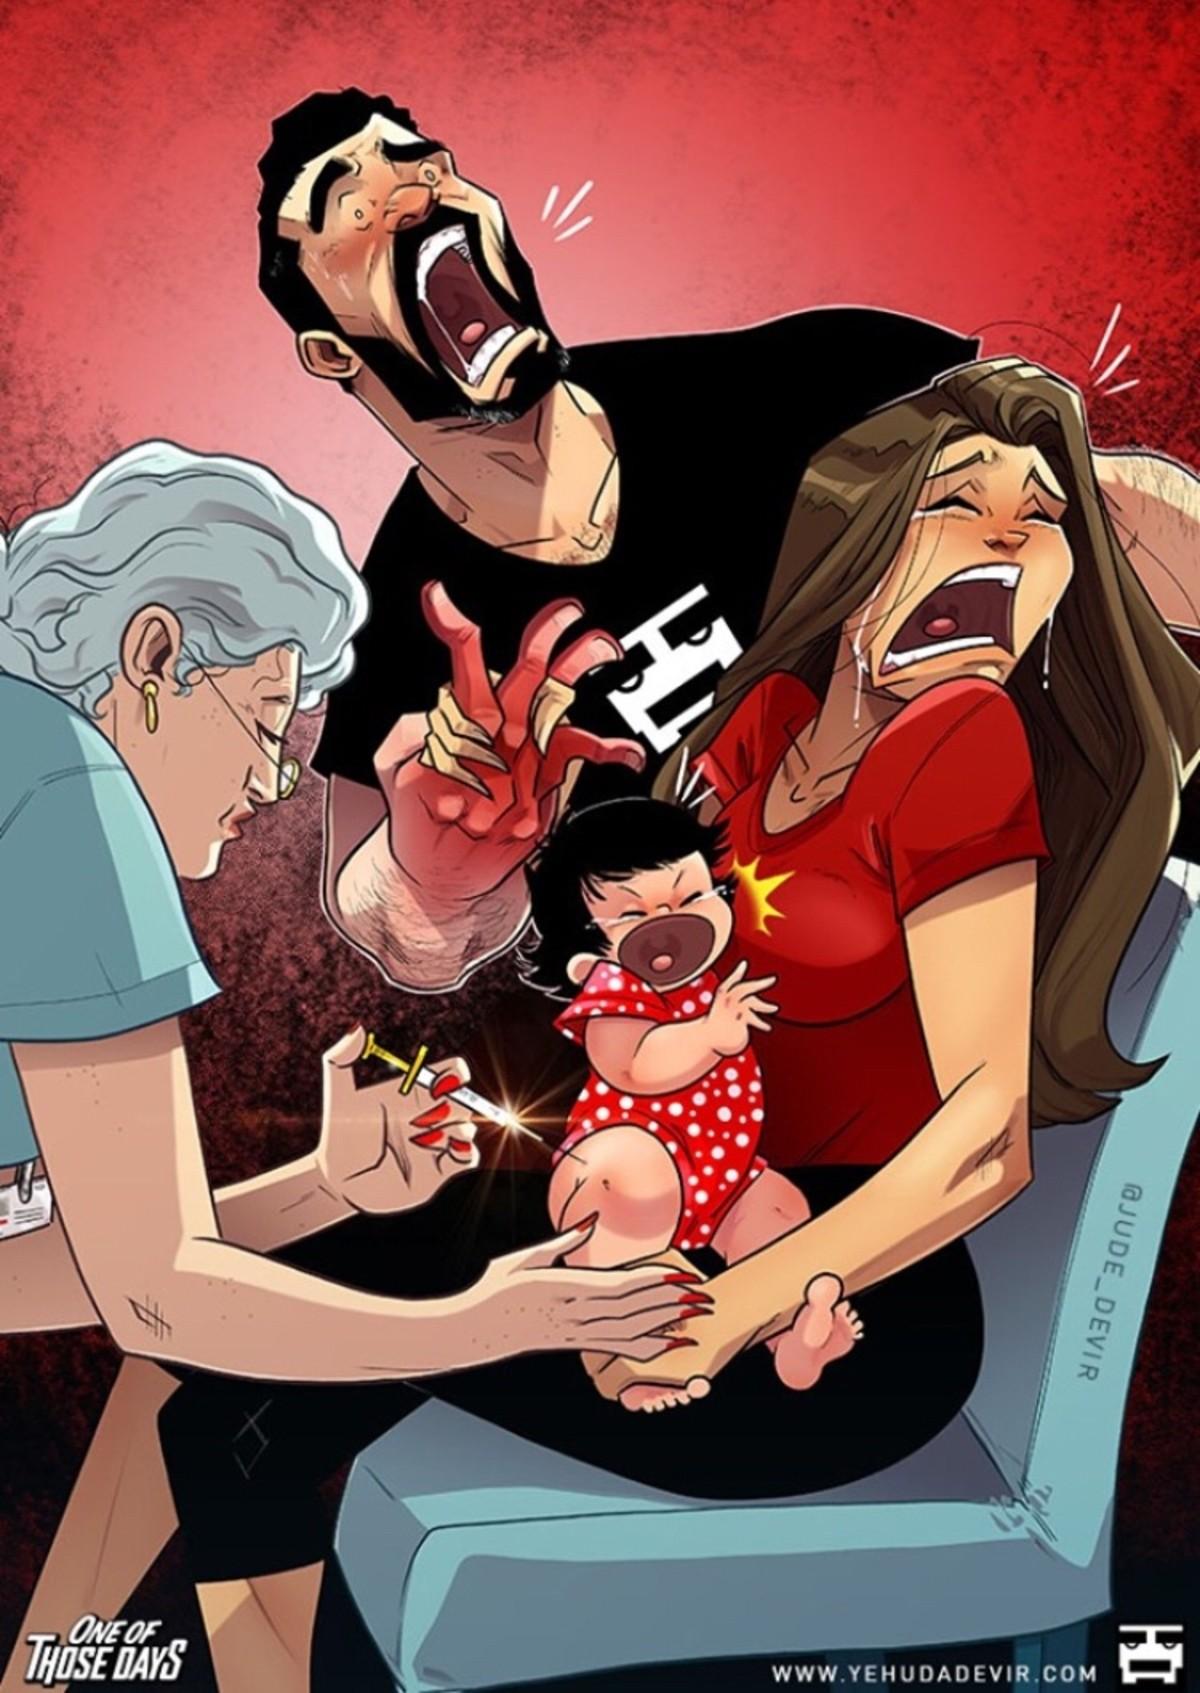 Иегуда Девир jude devir комикс ребенок прививка